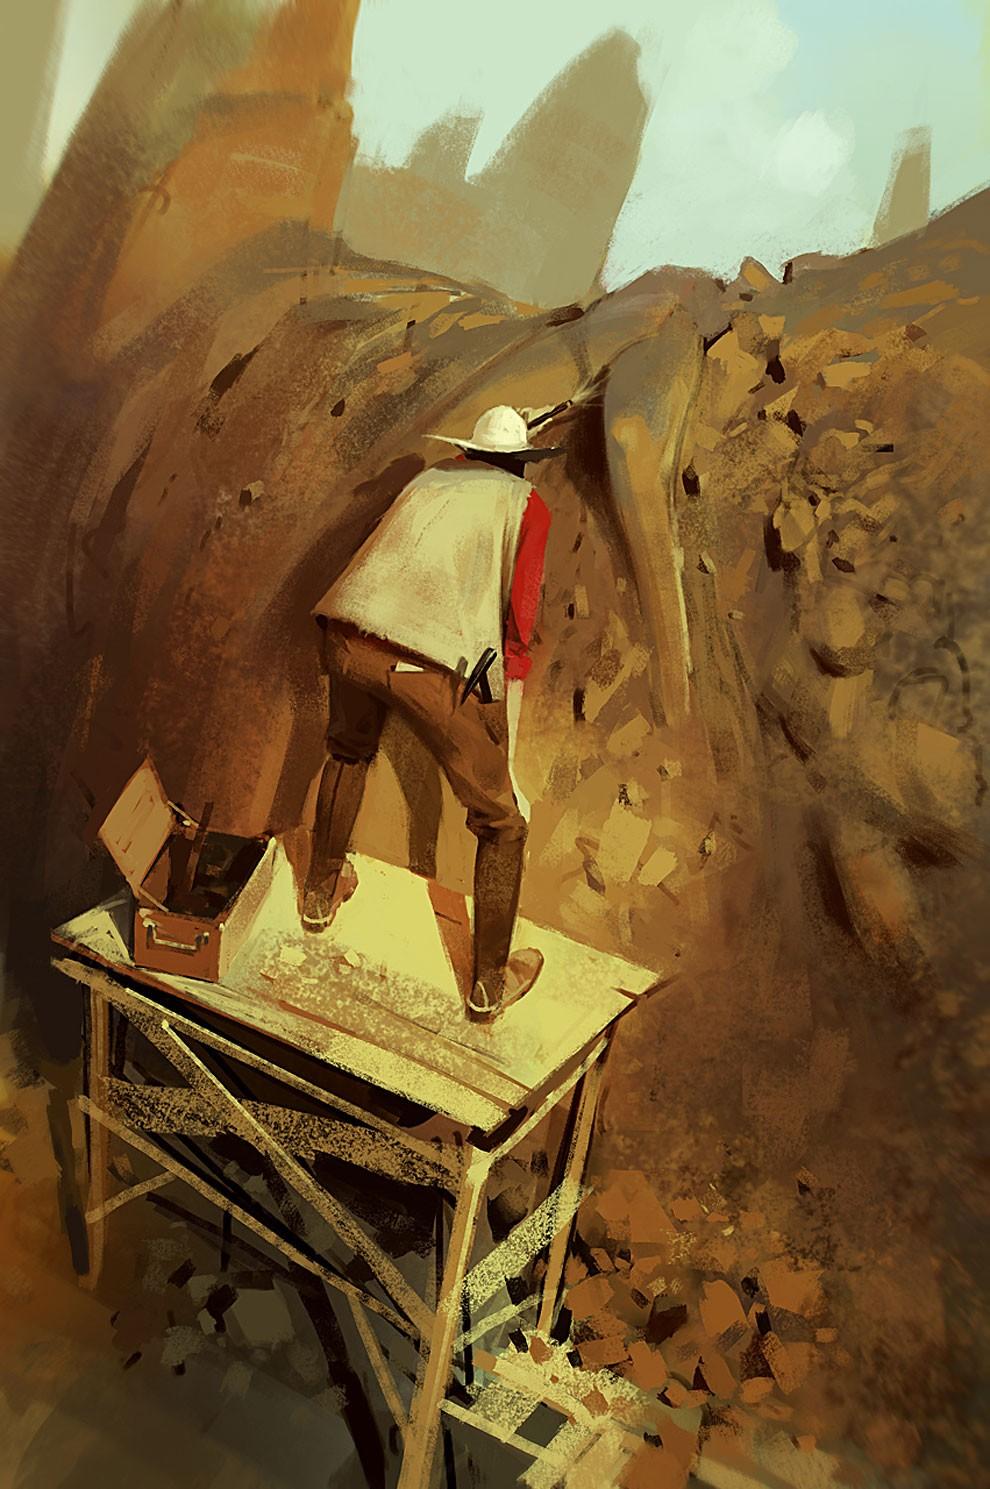 dipinti-digitali-horror-fantasy-sergey-kolesov-peleng-40